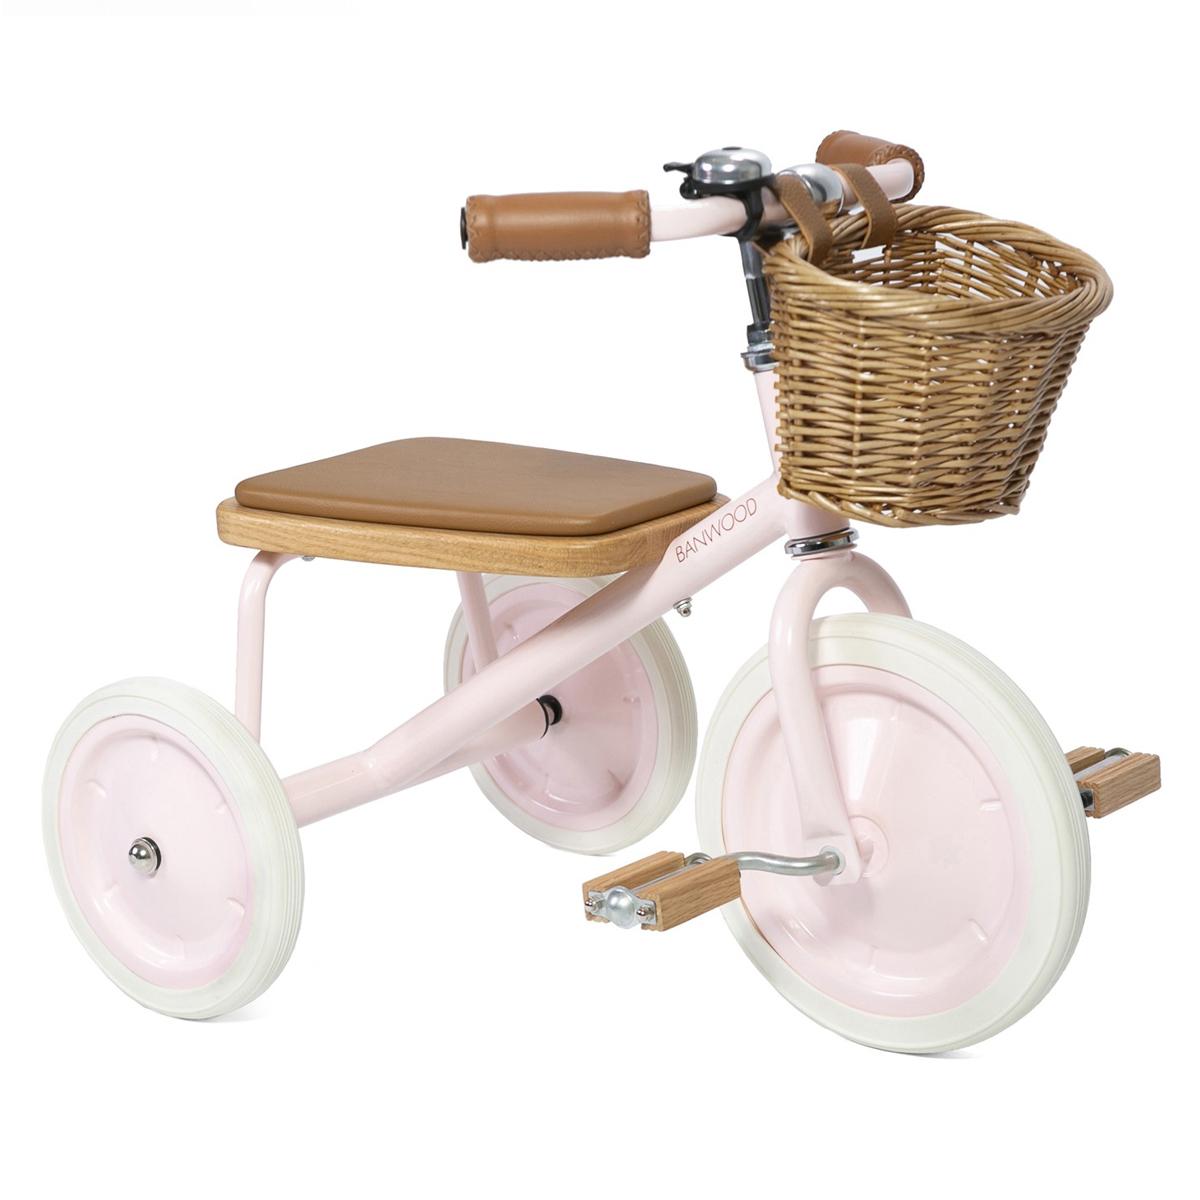 Trotteur & Porteur Tricycle Trike - Rose Pale Tricycle Trike - Rose Pale